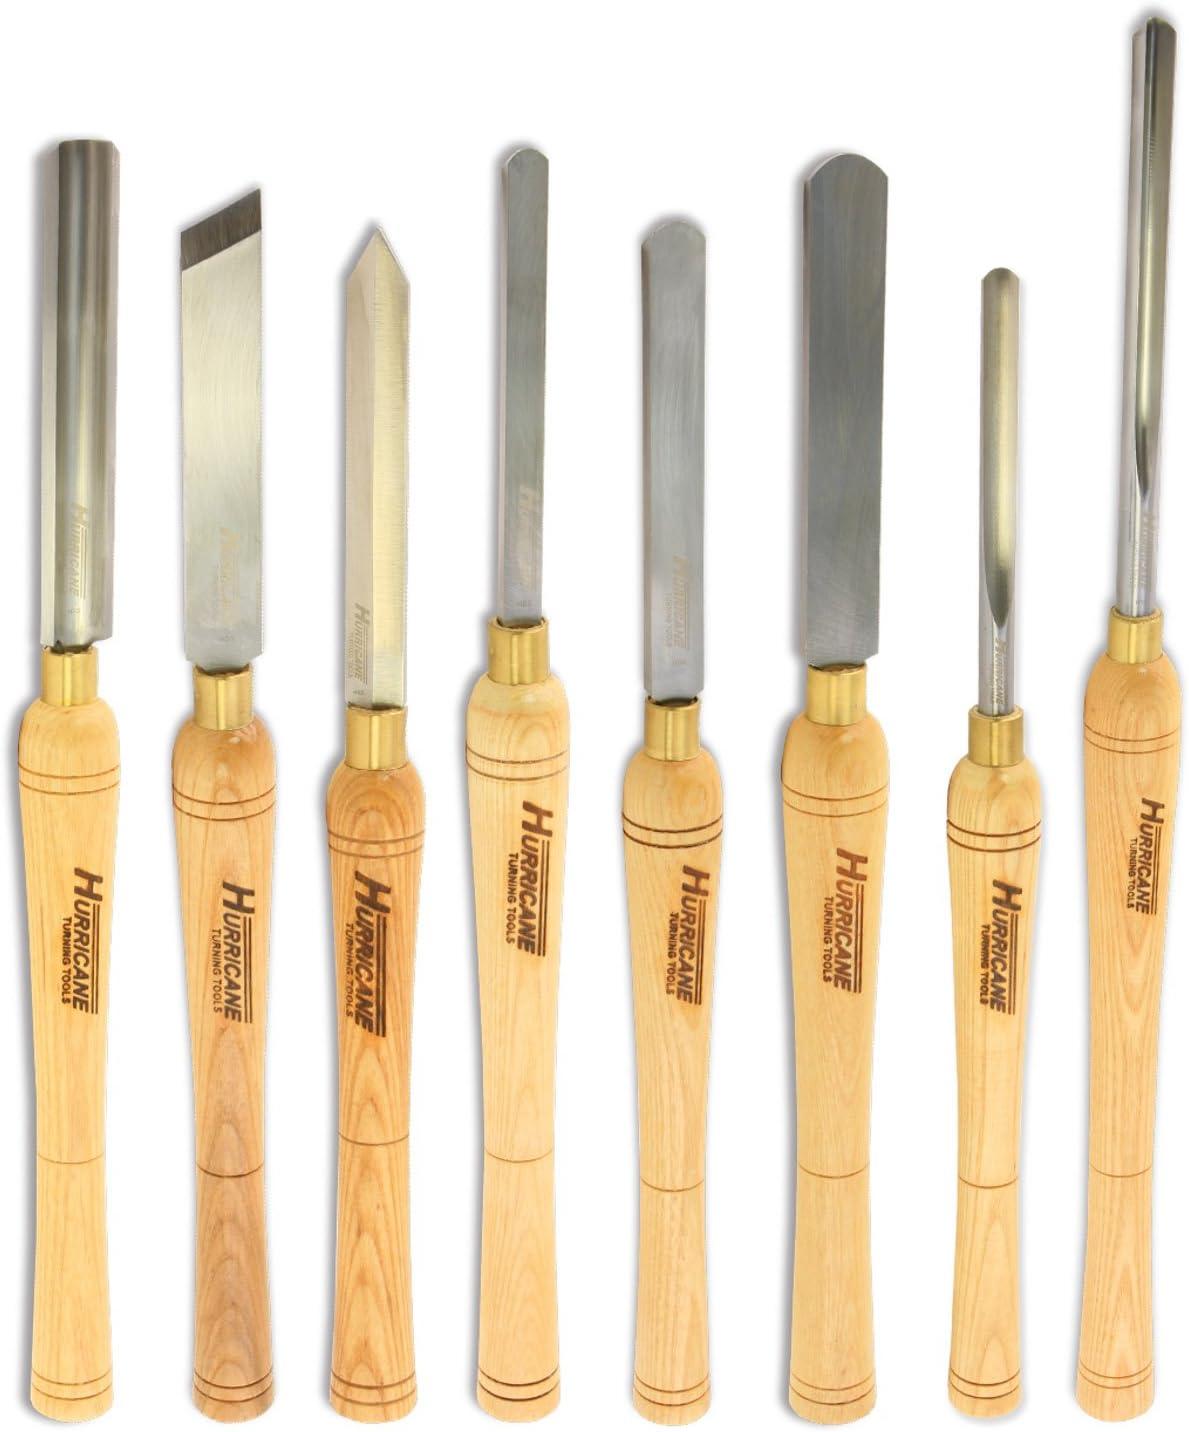 Hurricane Turning Tools HSS 8 Starter Piece Set Standard supreme Super sale period limited Seri